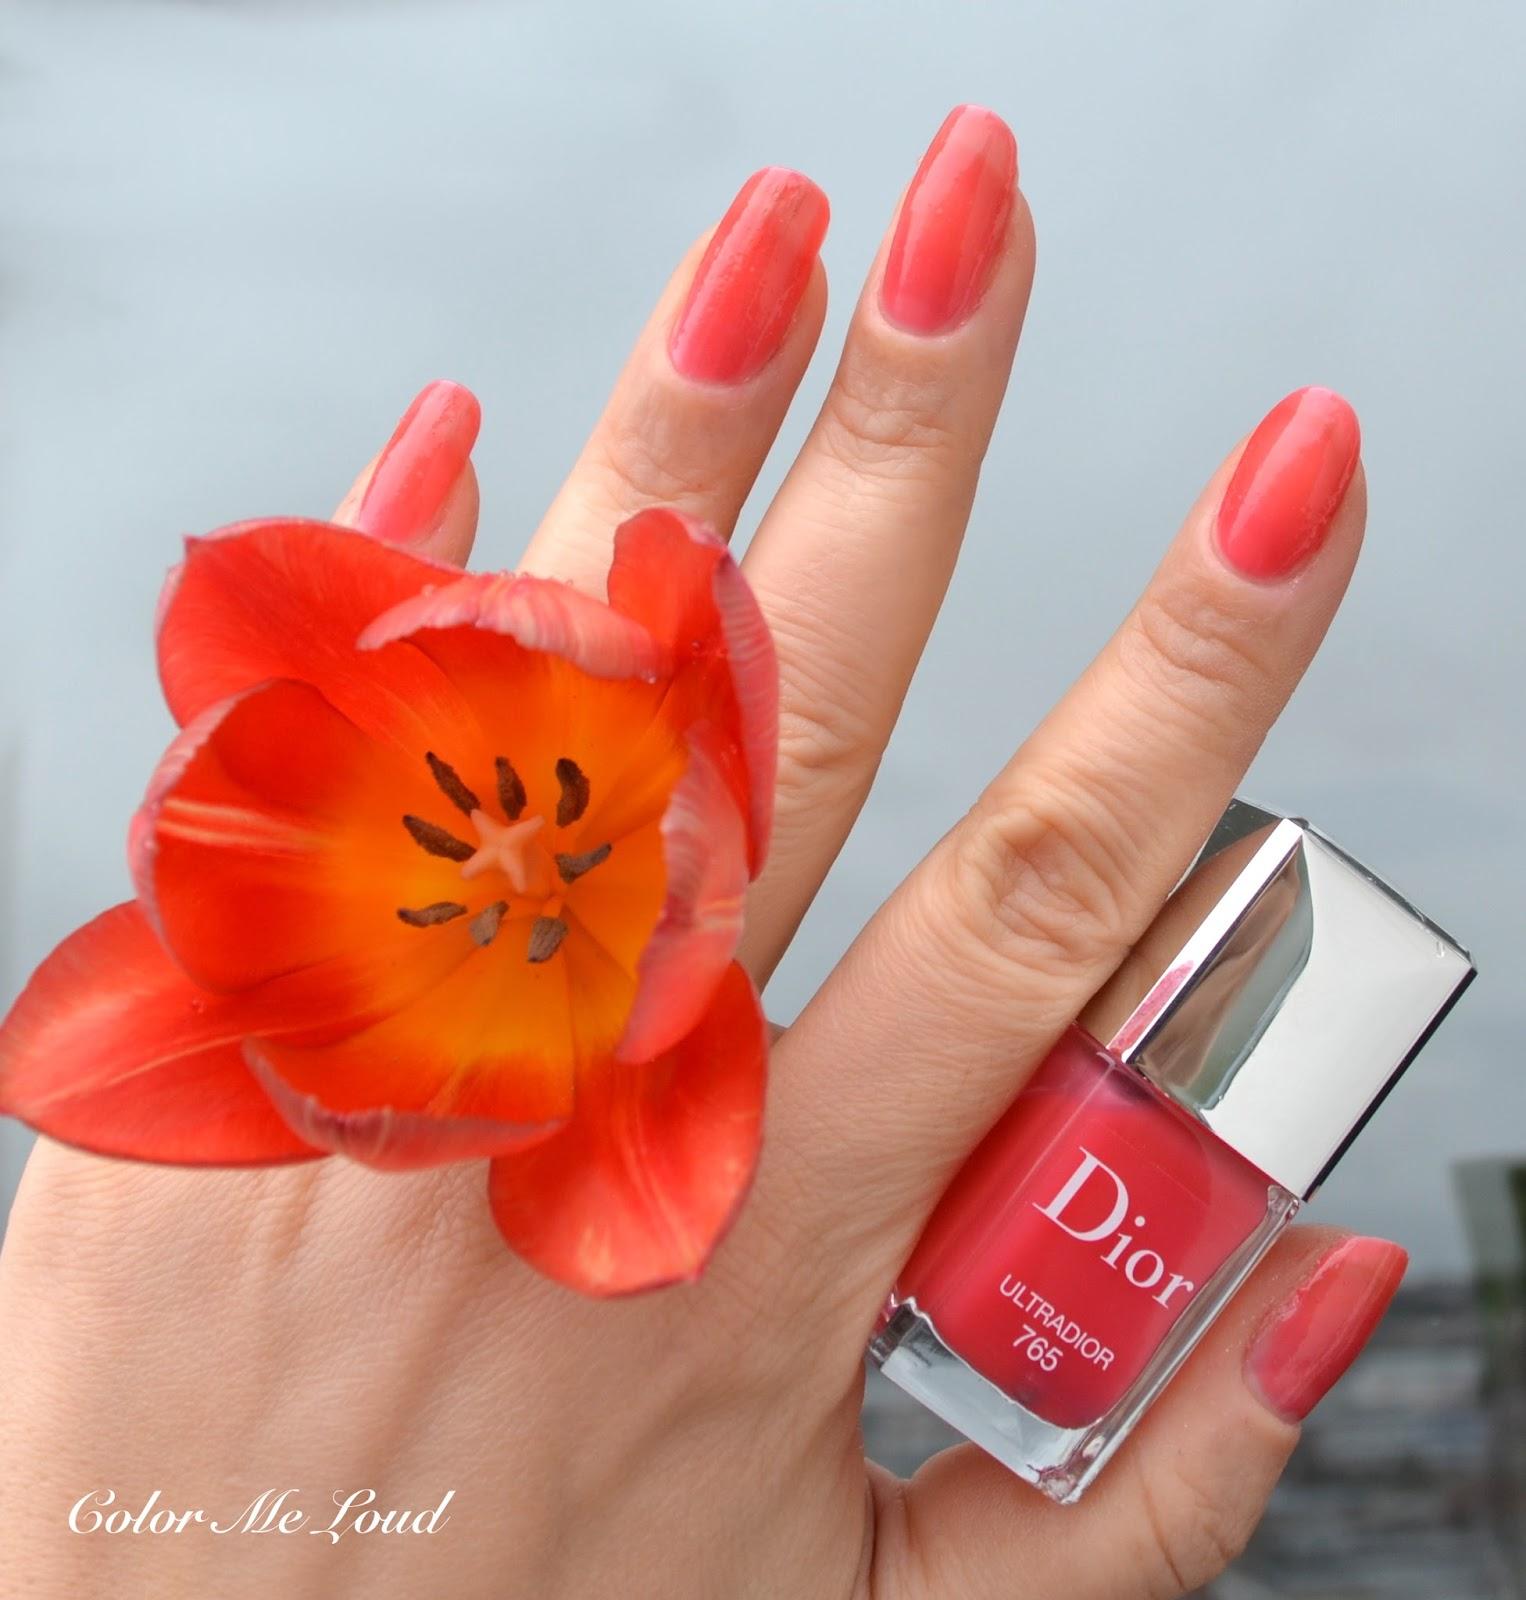 Dior Vernis #656 Cosmic, #676 Cruise & #765 Ultradior for Addict ...